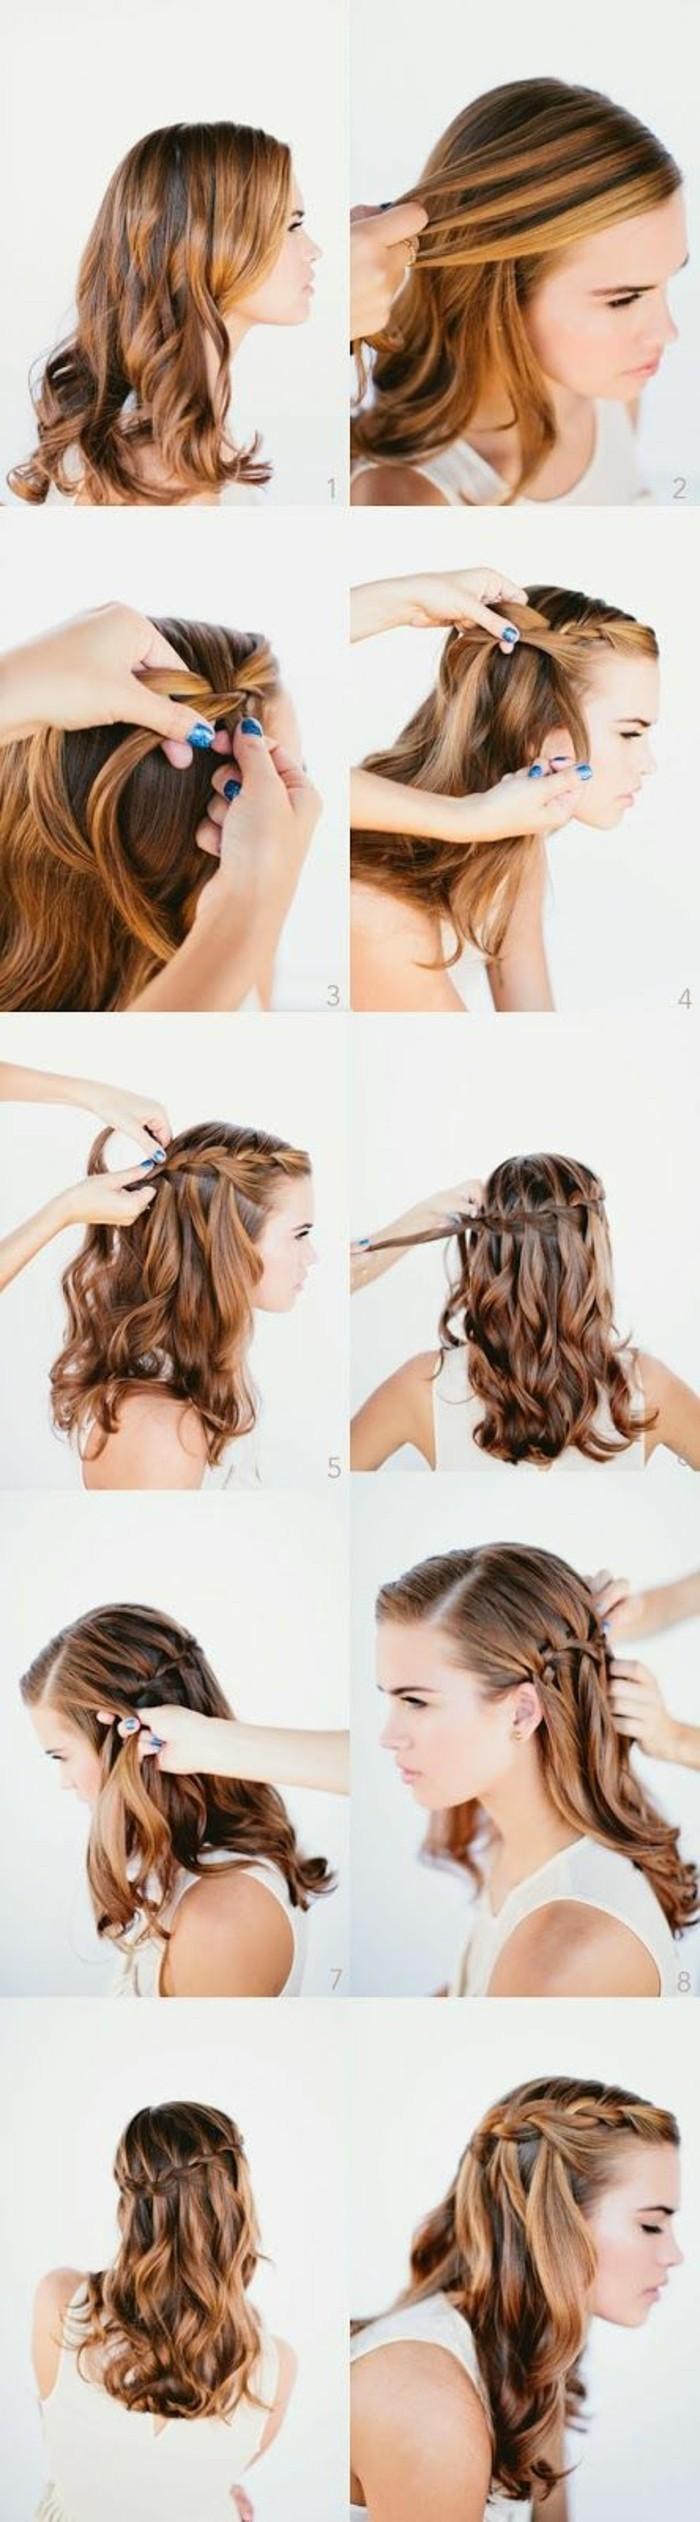 peinados faciles y rapidos para cada ocasion, semirecogido trenzado para media melena